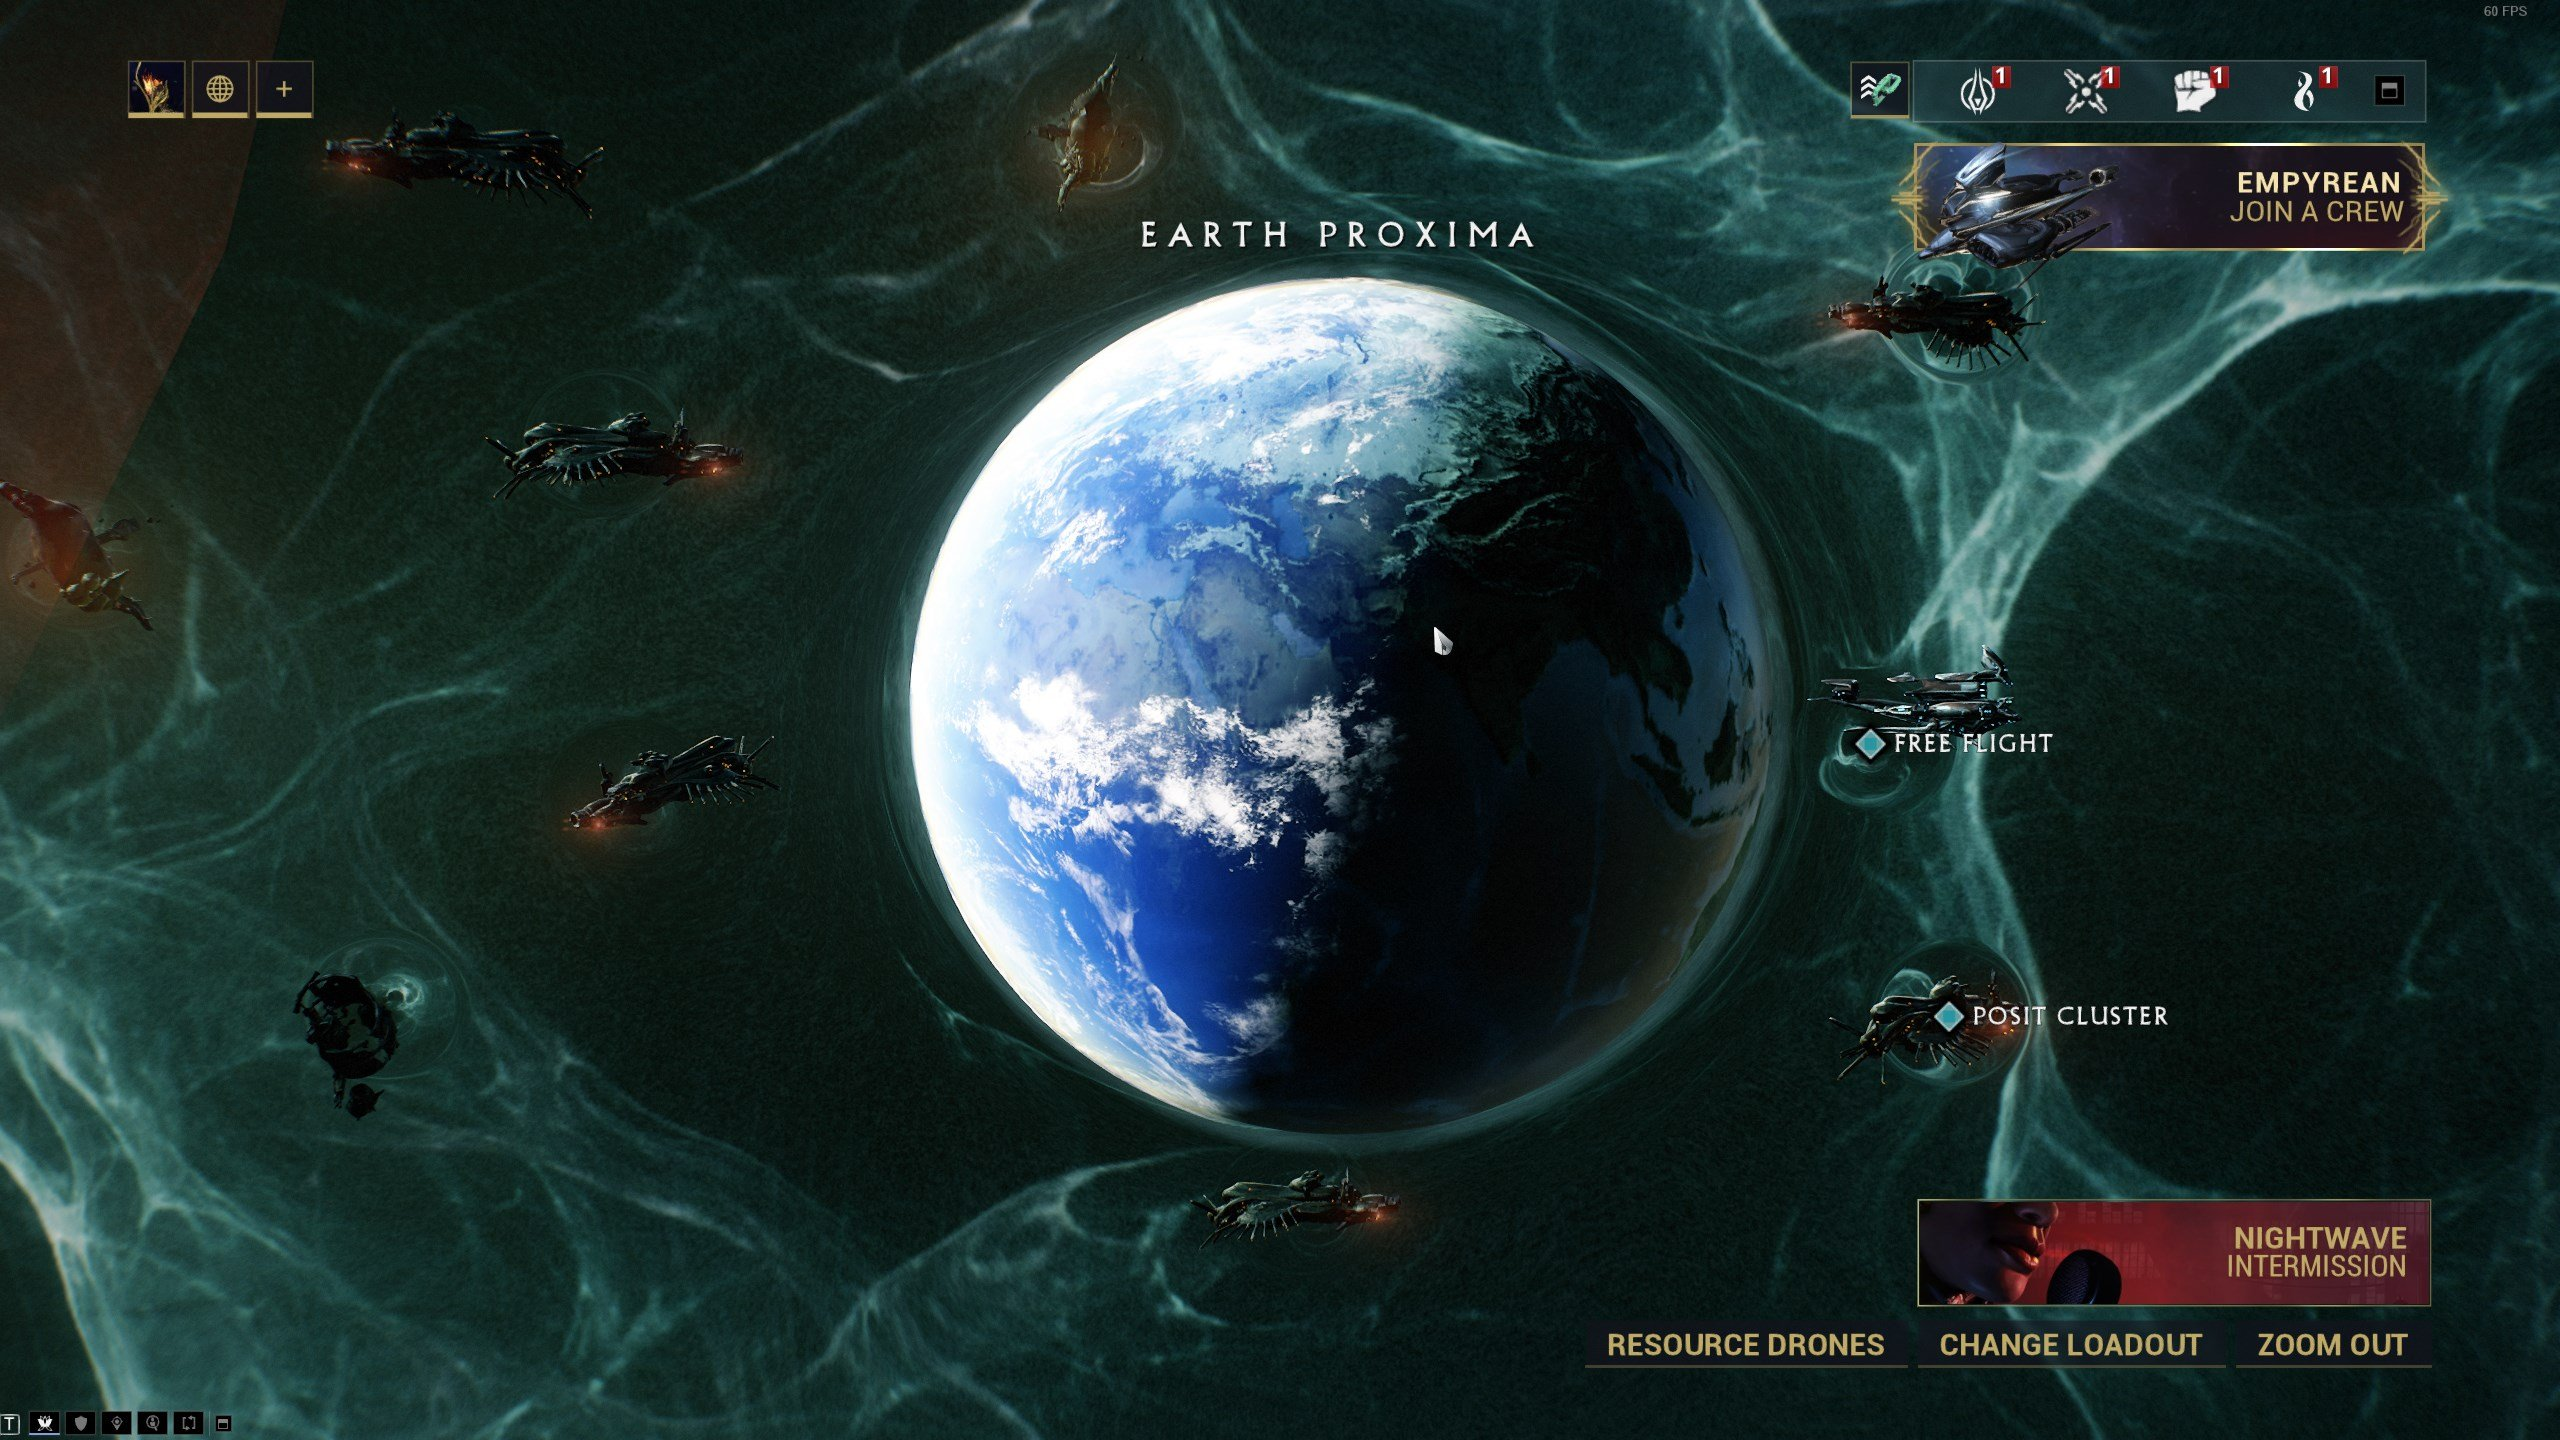 Warframe Empyrean - Earth Proxima missions